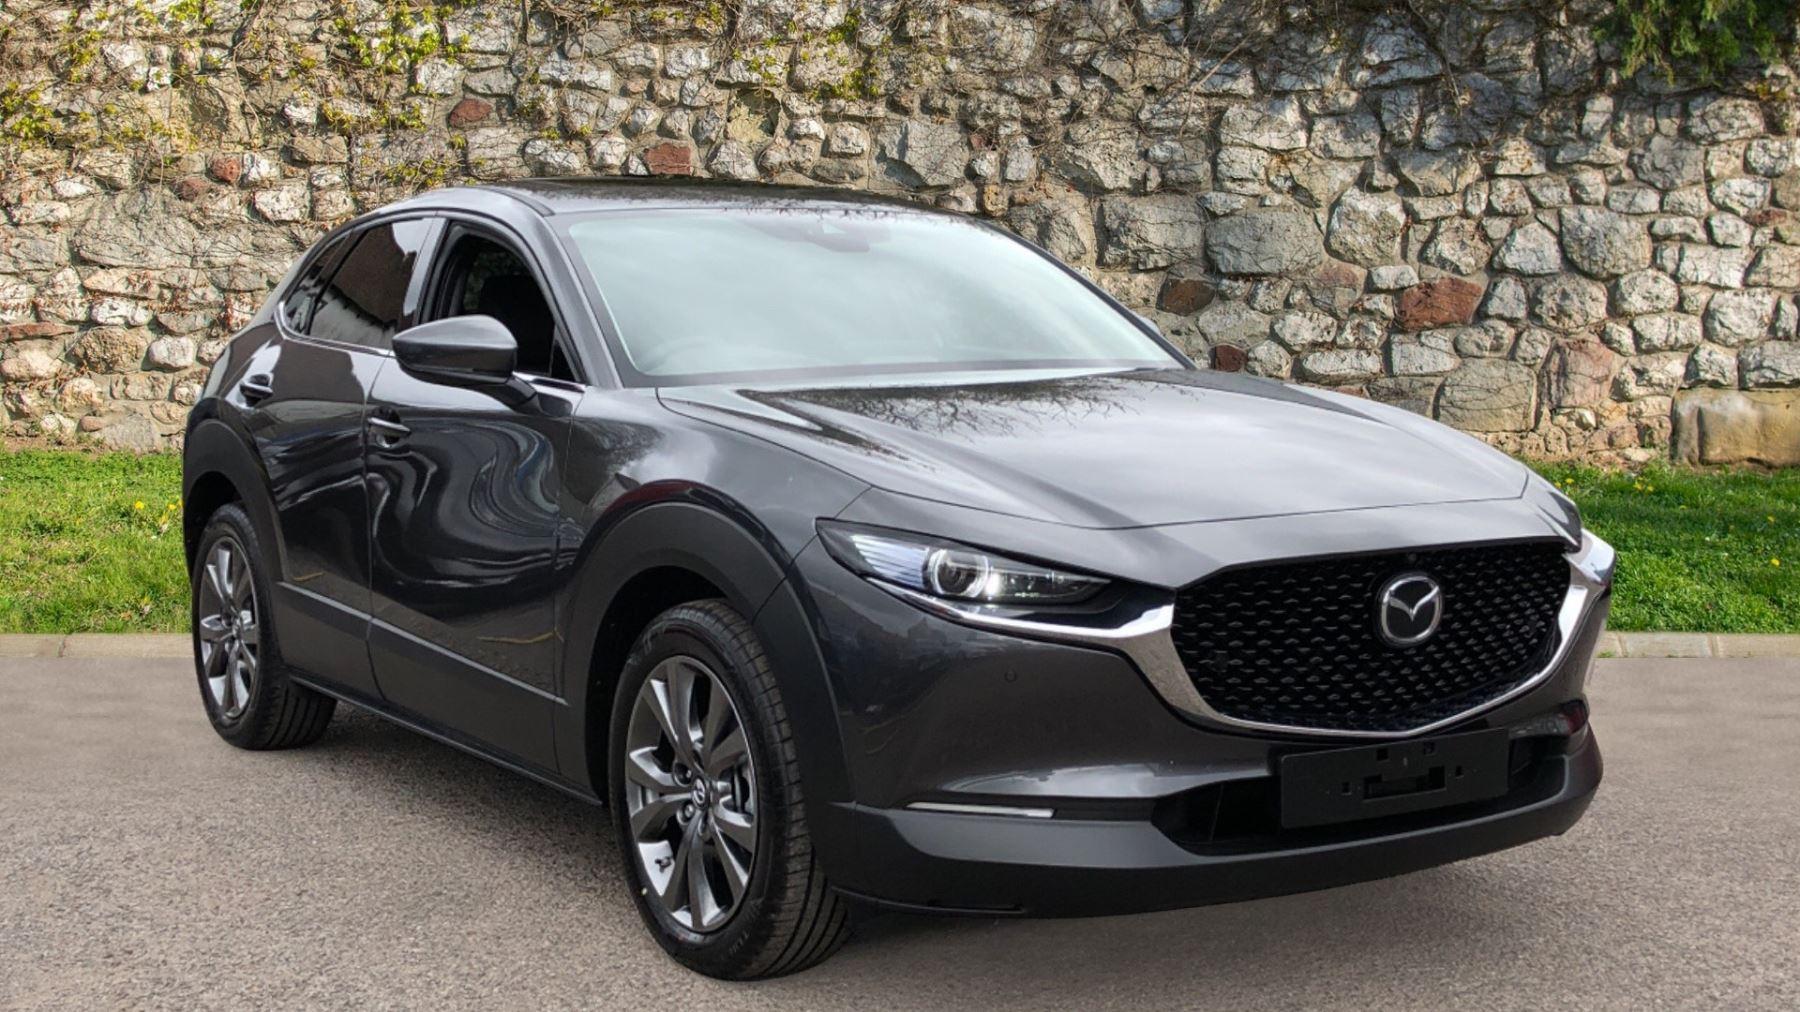 Mazda CX-30 2.0 Skyactiv-X MHEV 186 SE-L Lux Automatic 5 door Hatchback